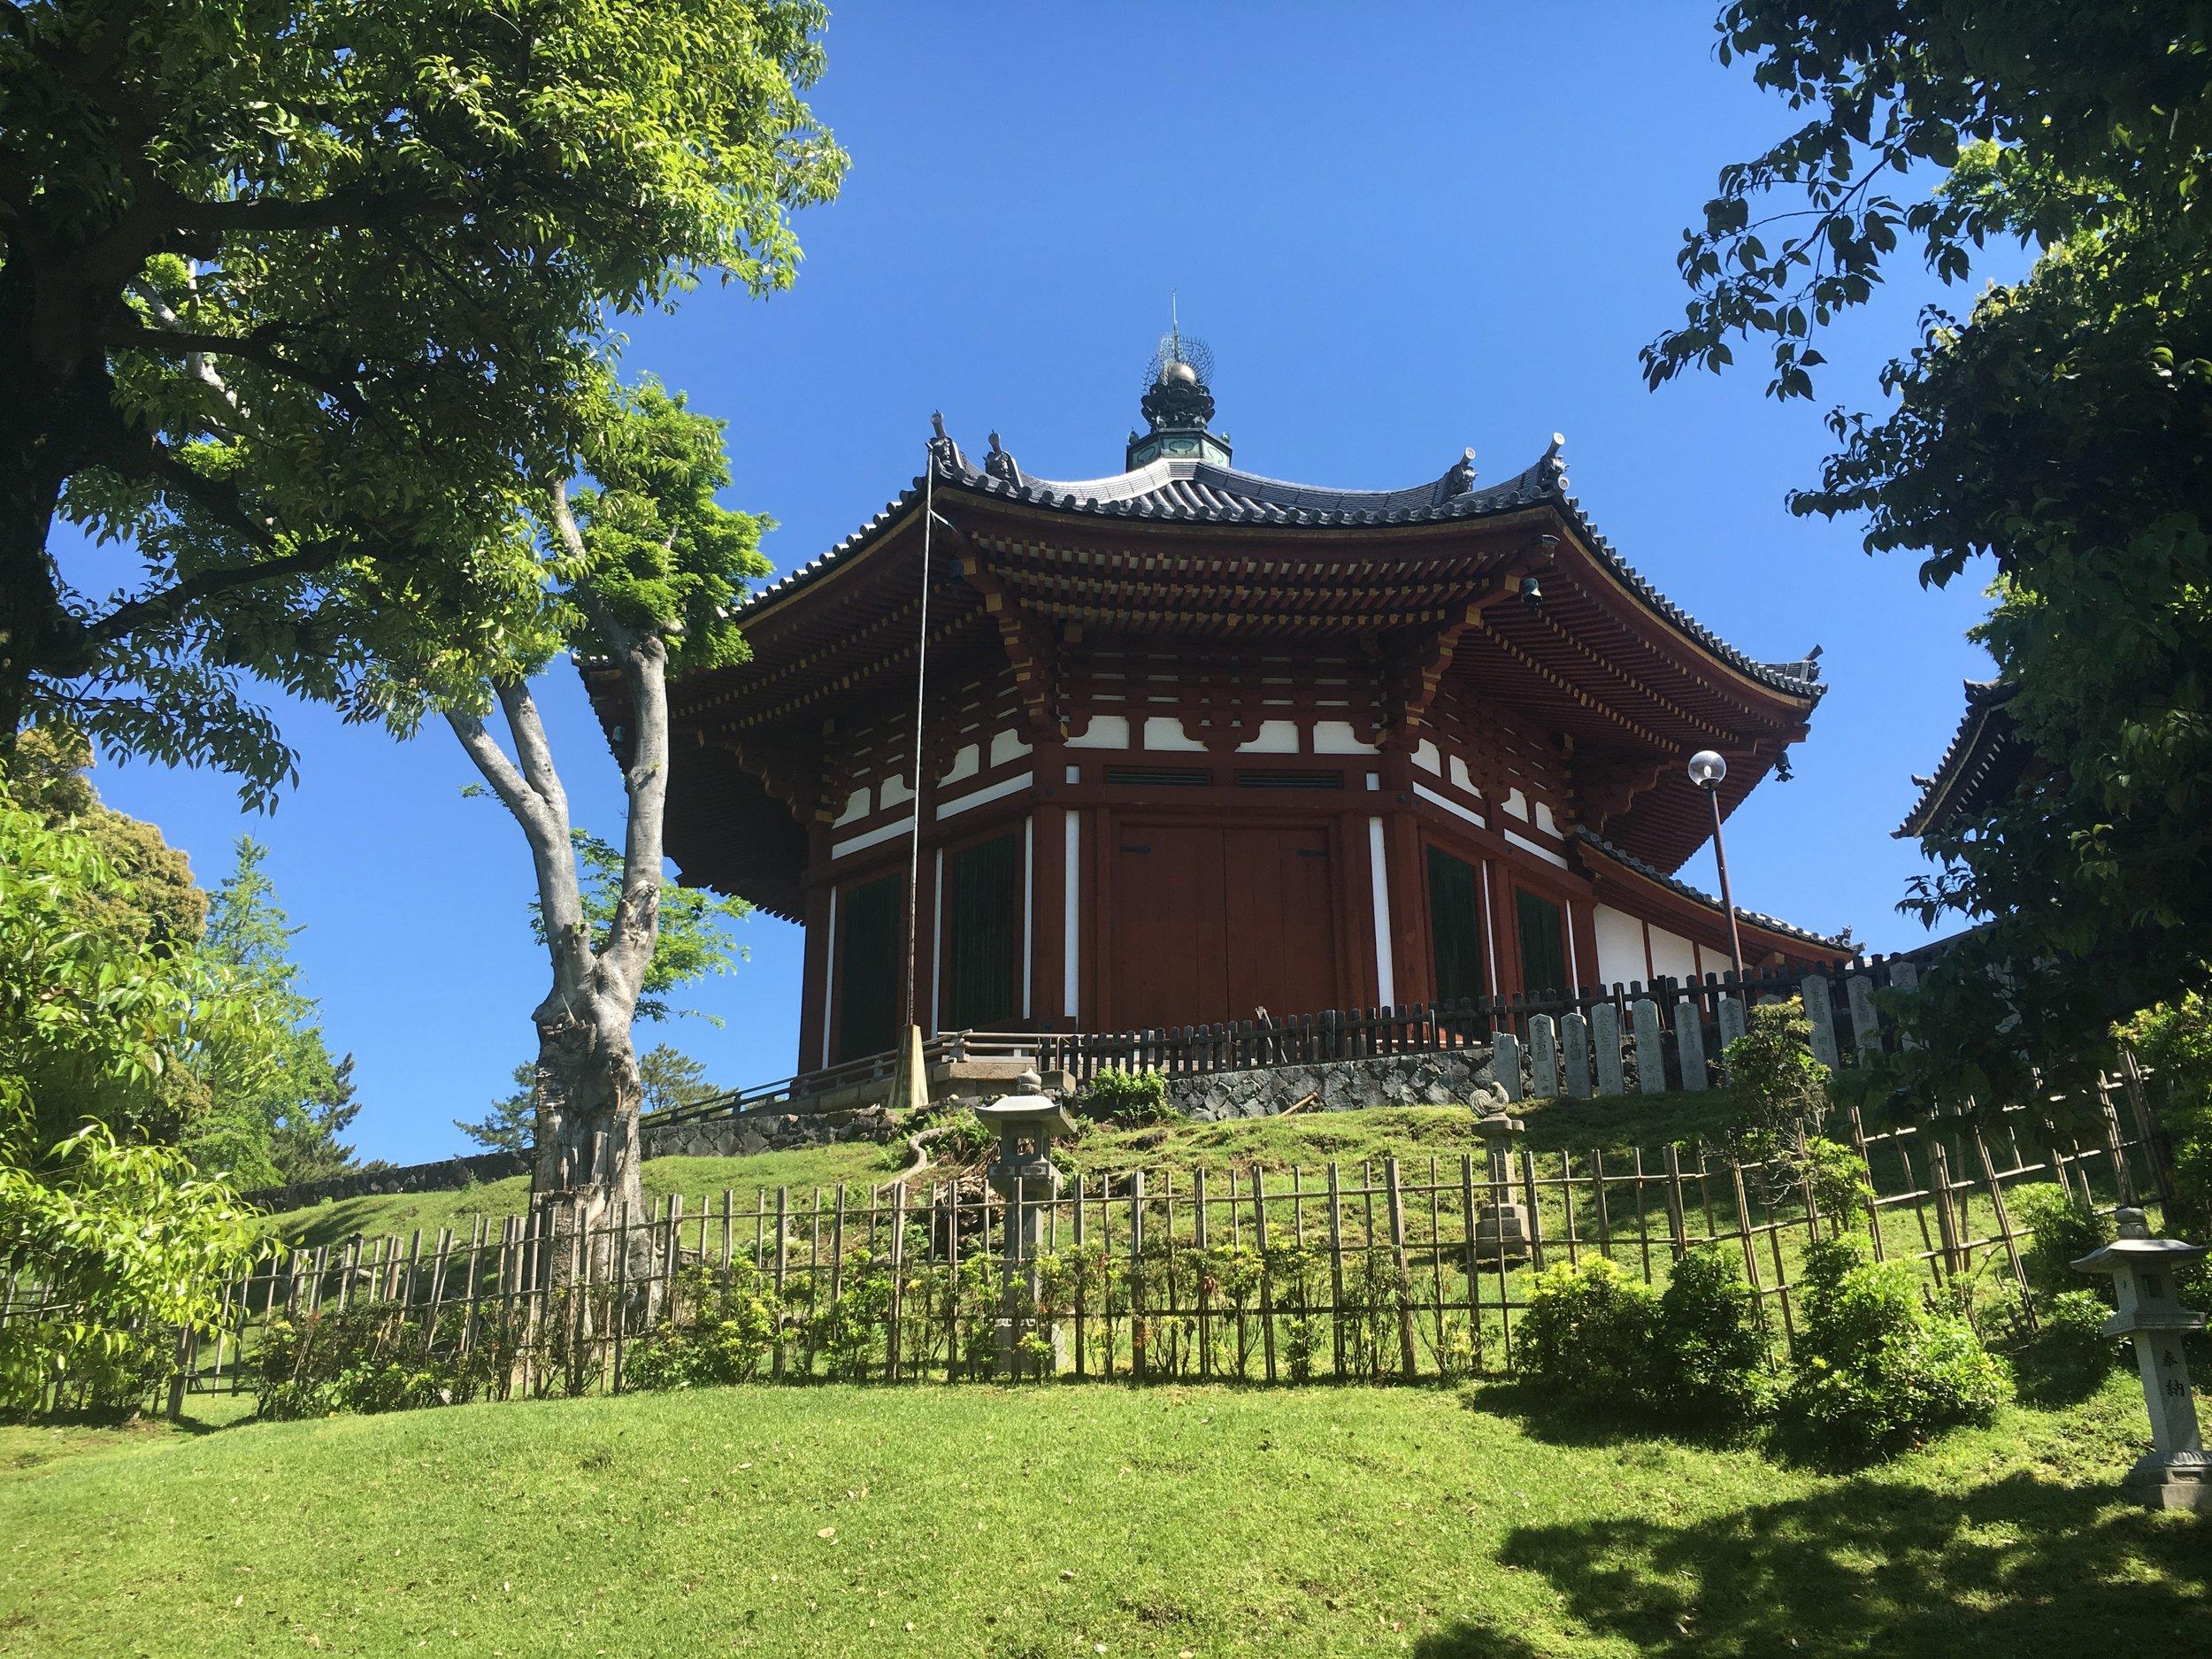 Nanendo Buddhist Temple, simply stunning!